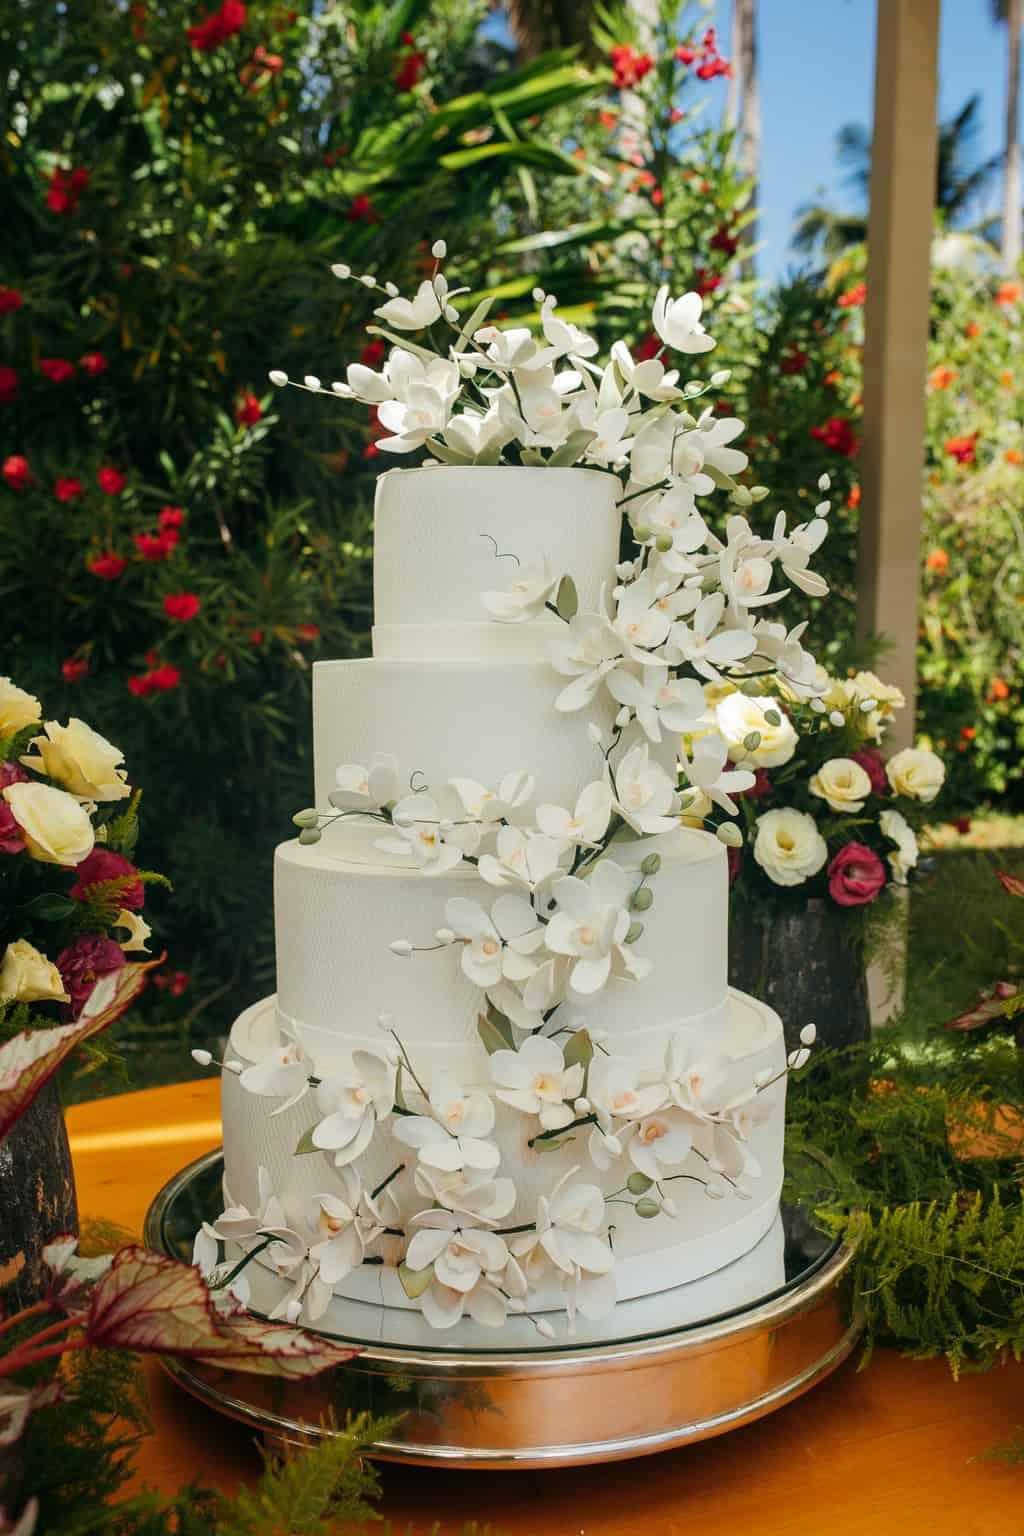 Casamento-Gardenia-e-Marcos-Antonio-Paulo-Bezerra-Joao-Curvelo-Carol-Maiorano-bolo